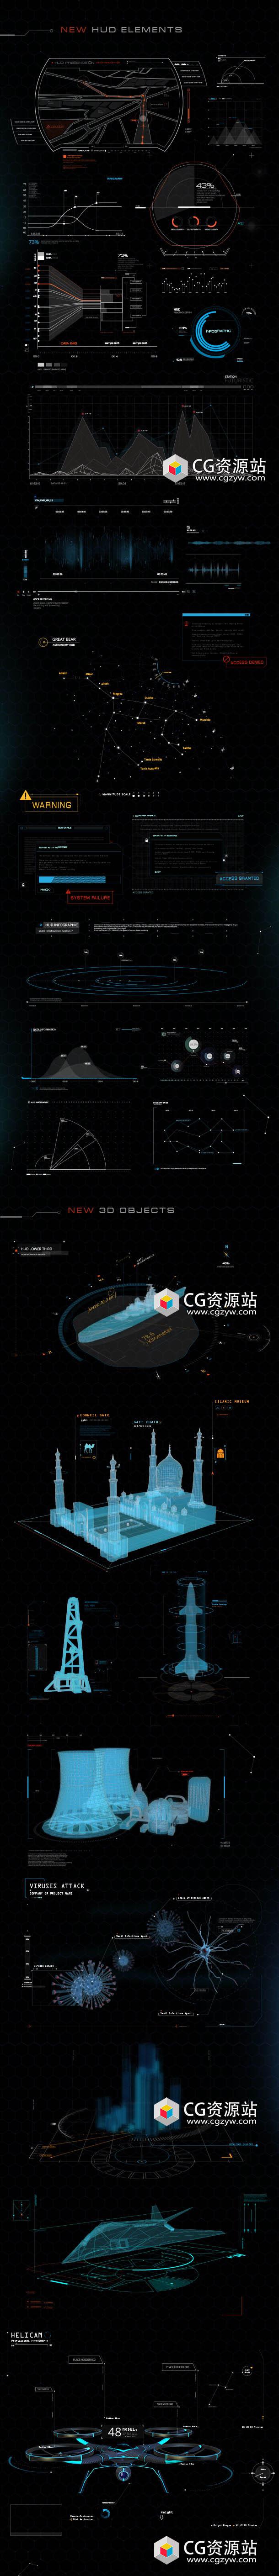 AE模板+脚本-高科技军事信息化动态元素包 Quantum HUD Infographic V2(更新)